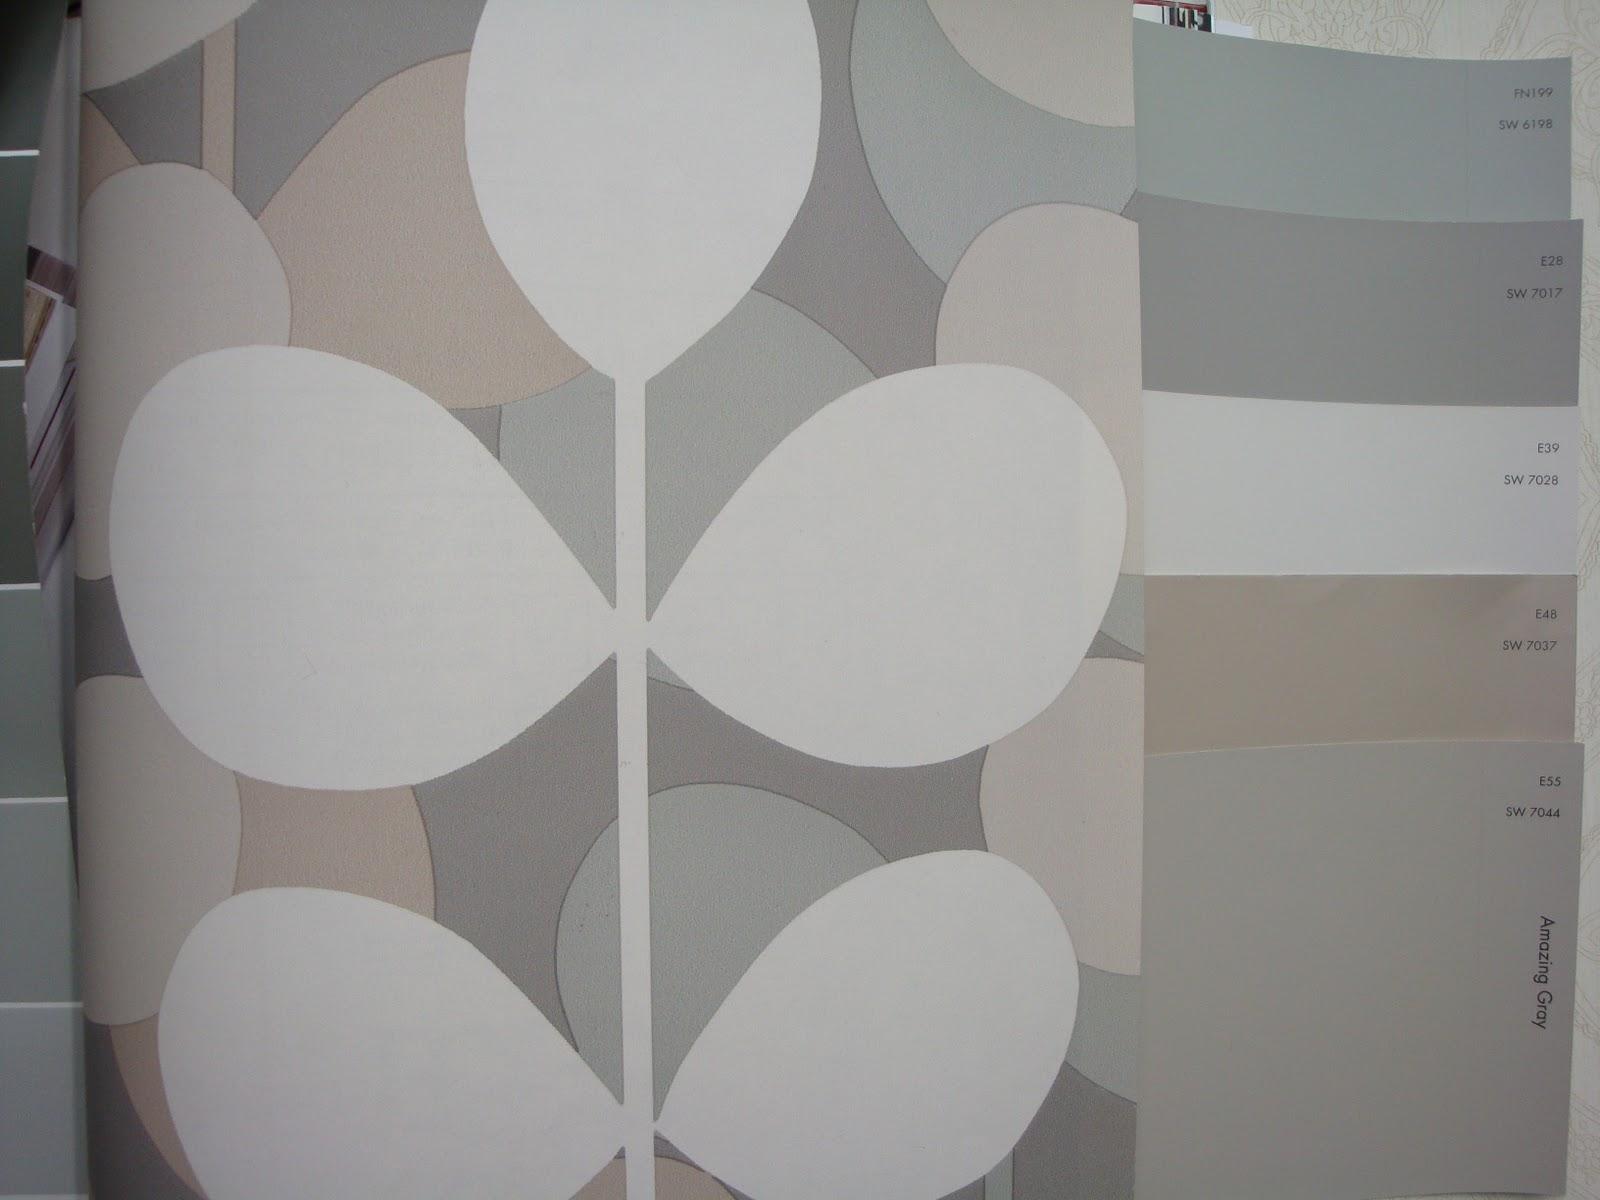 high definition wallpapercomphotosherwin williams wallpaper28html 1600x1200